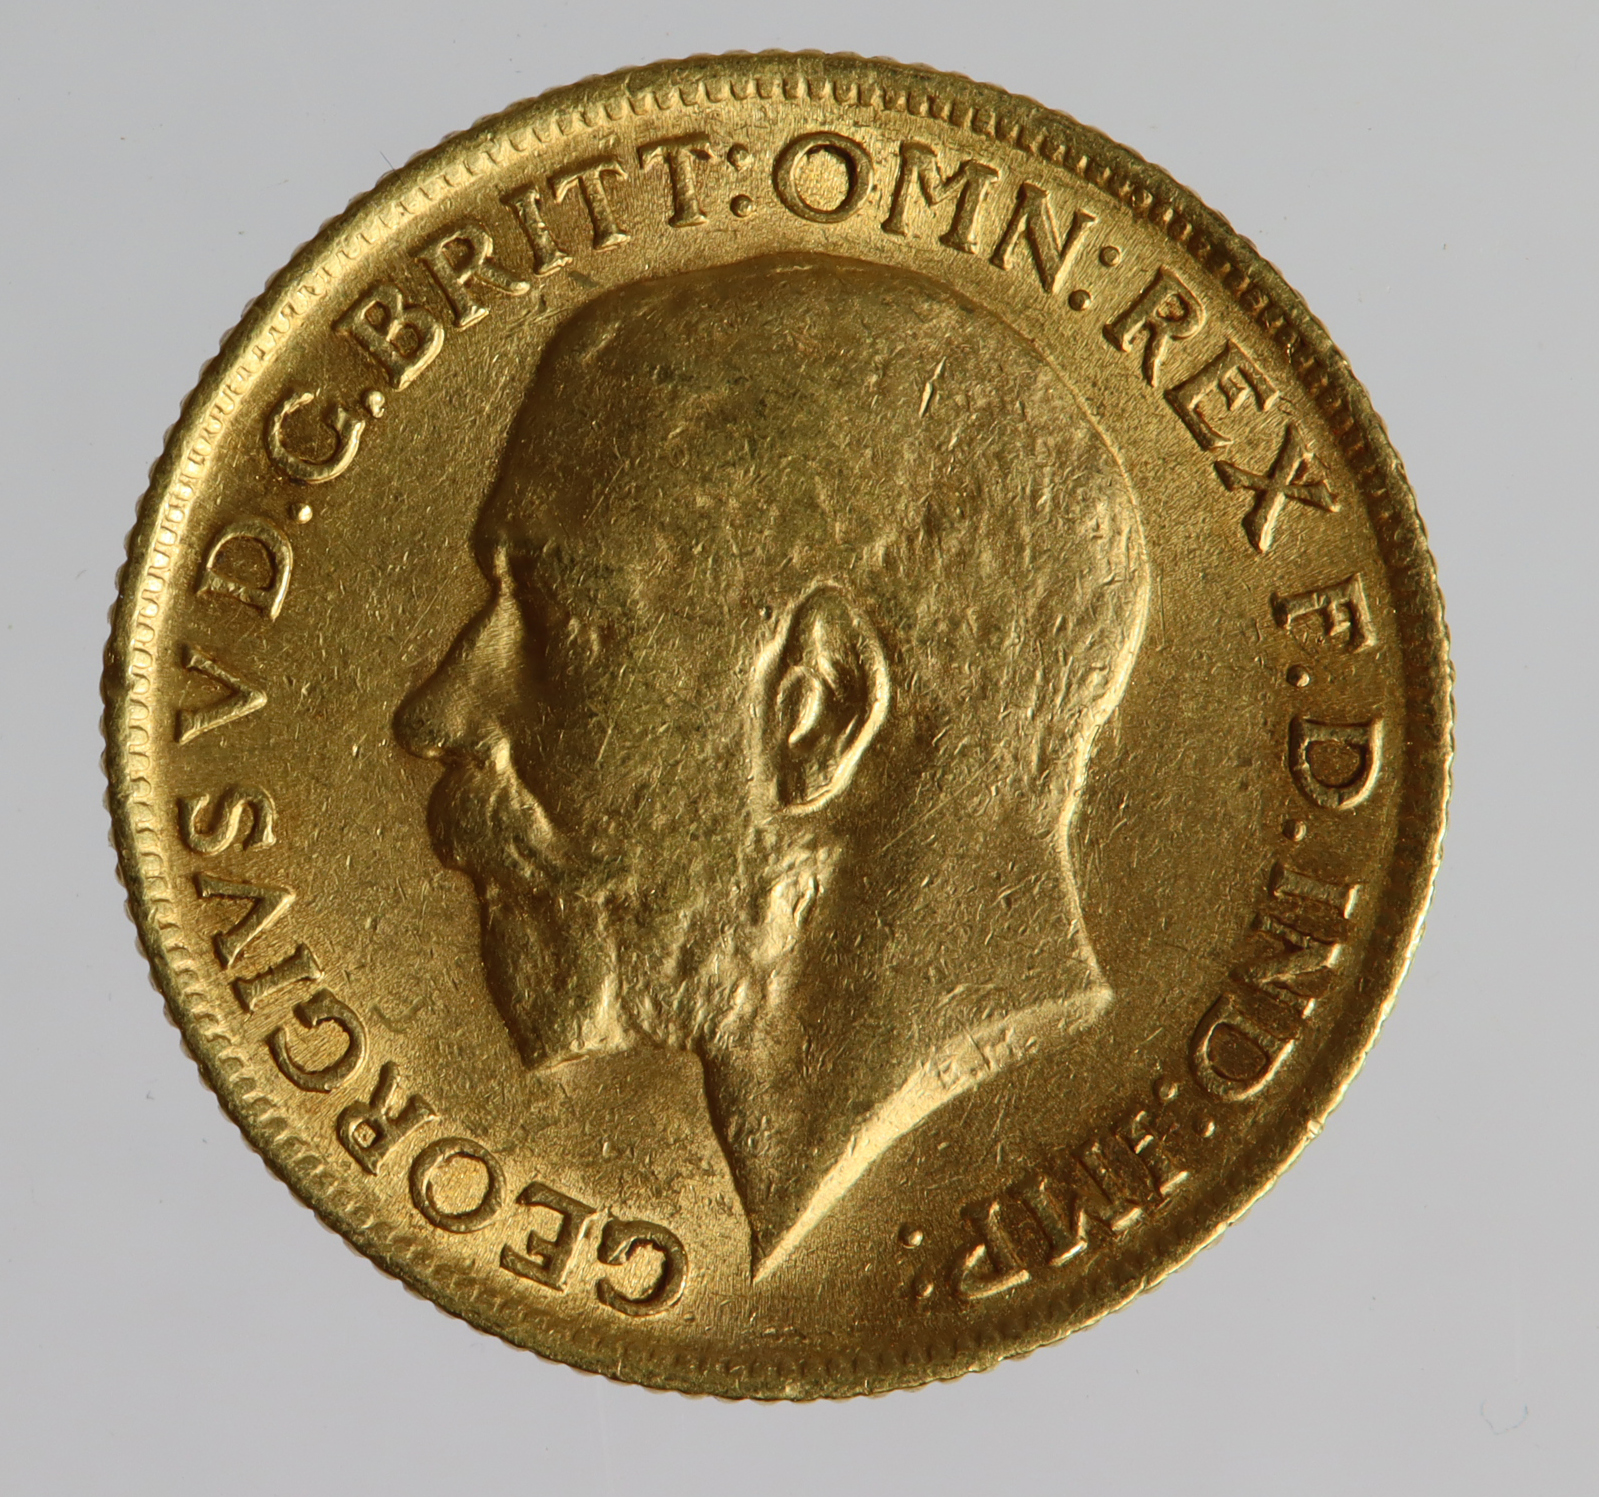 Sovereign 1915 VF